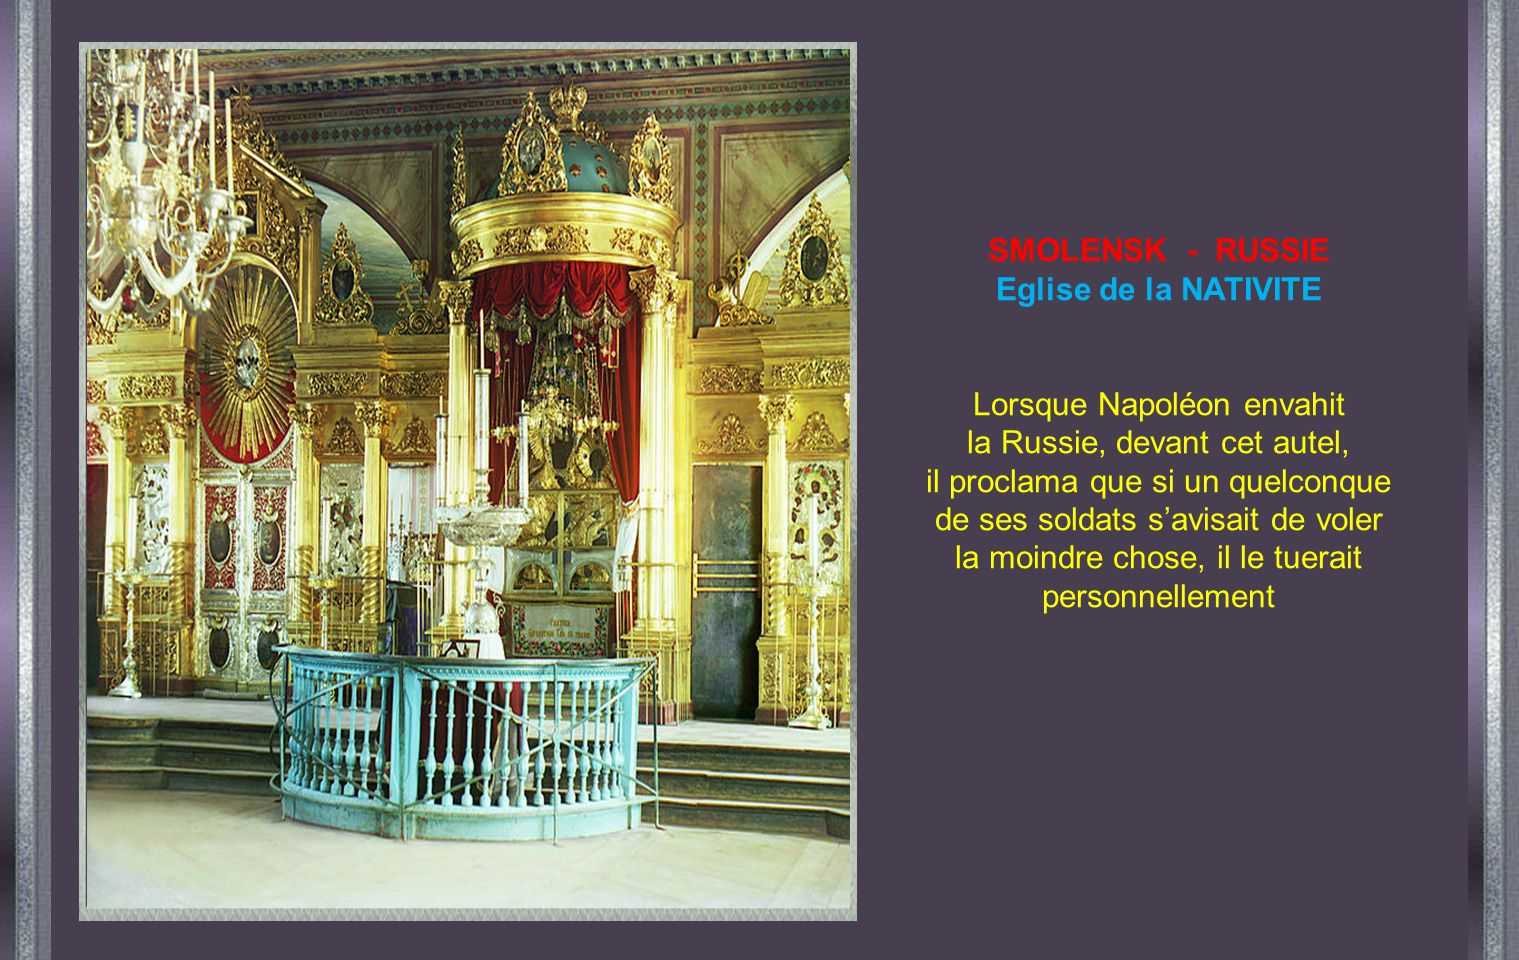 SMOLENSK - RUSSIE Eglise de la NATIVITE